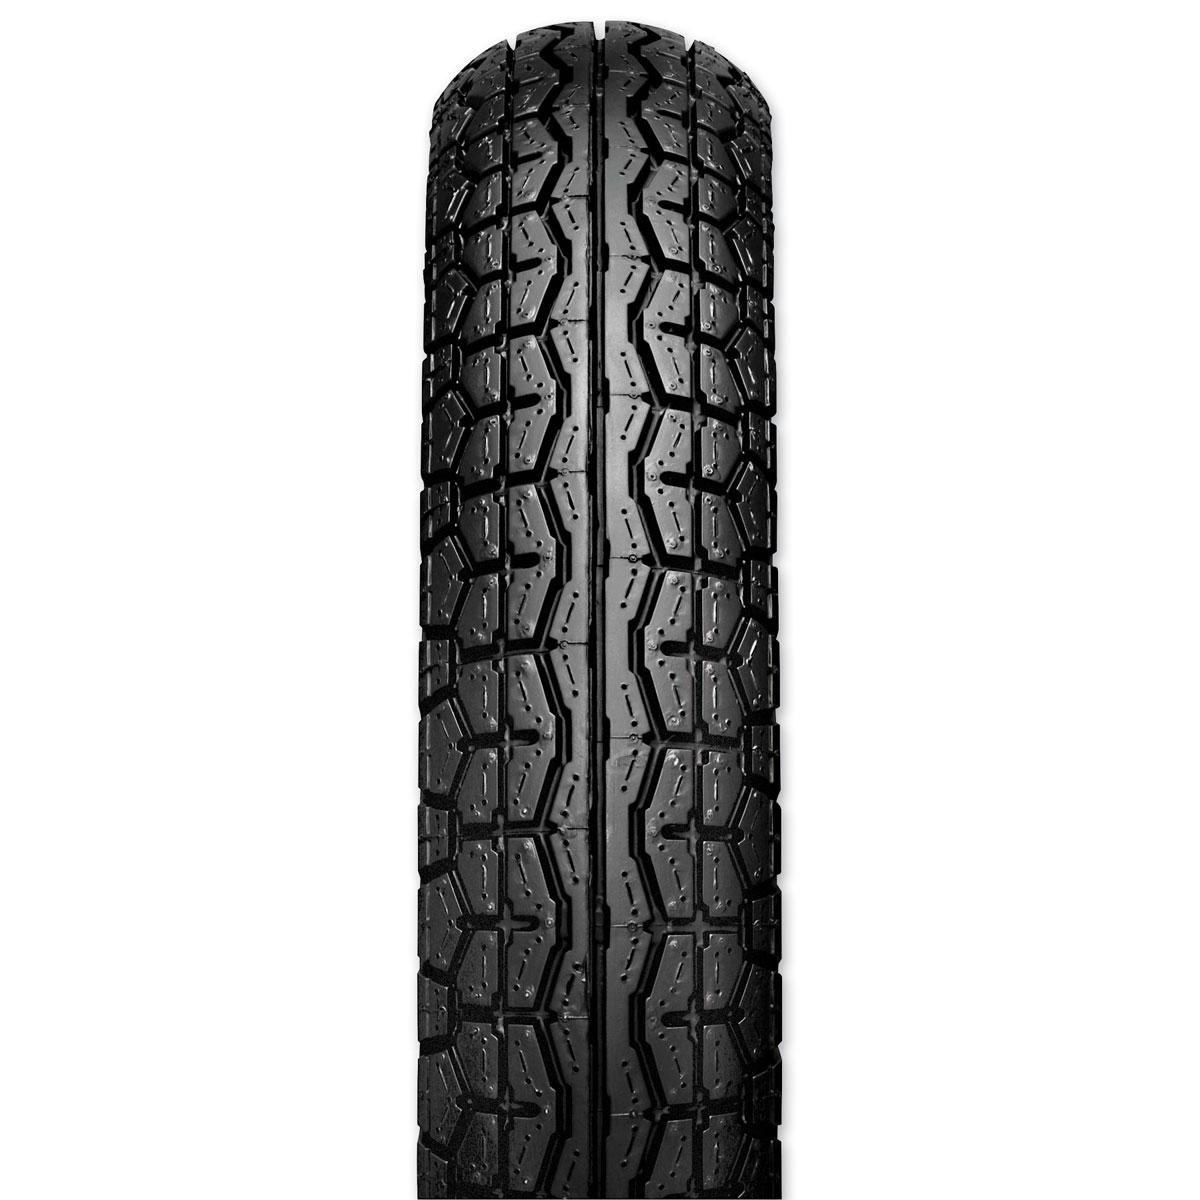 IRC GS11 4.00-18 Rear Tire